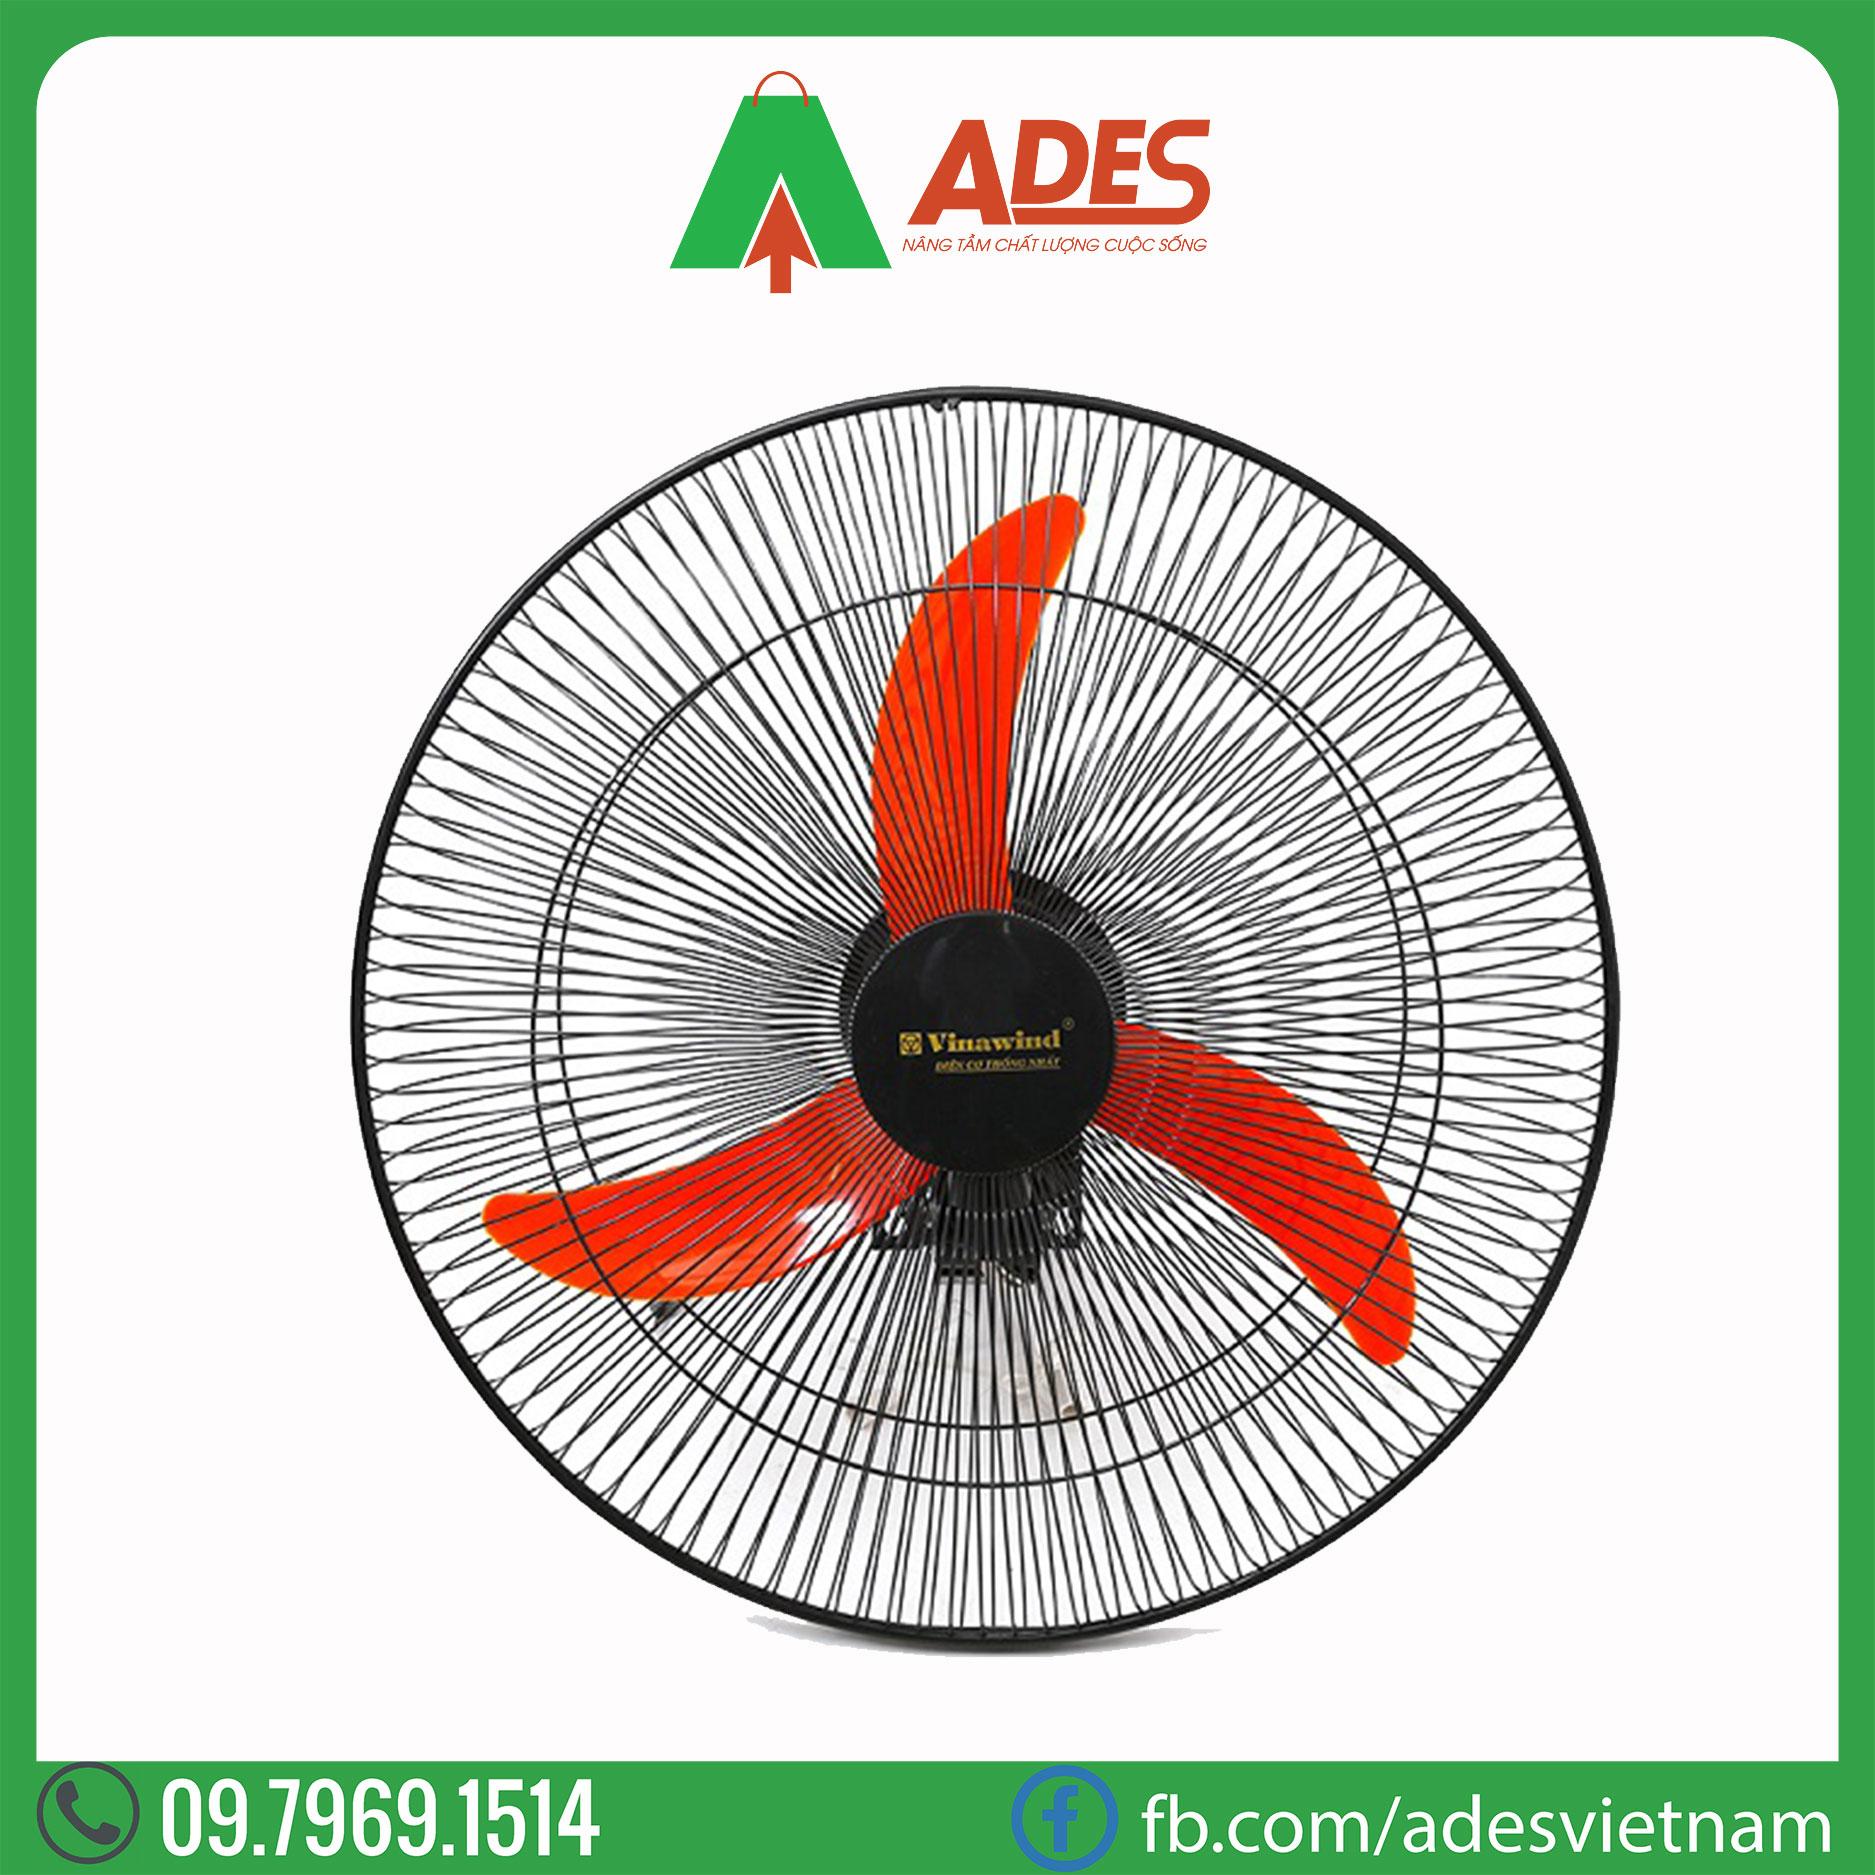 Quat treo tuong Vinawind QTT 450-DM Dien may ADES